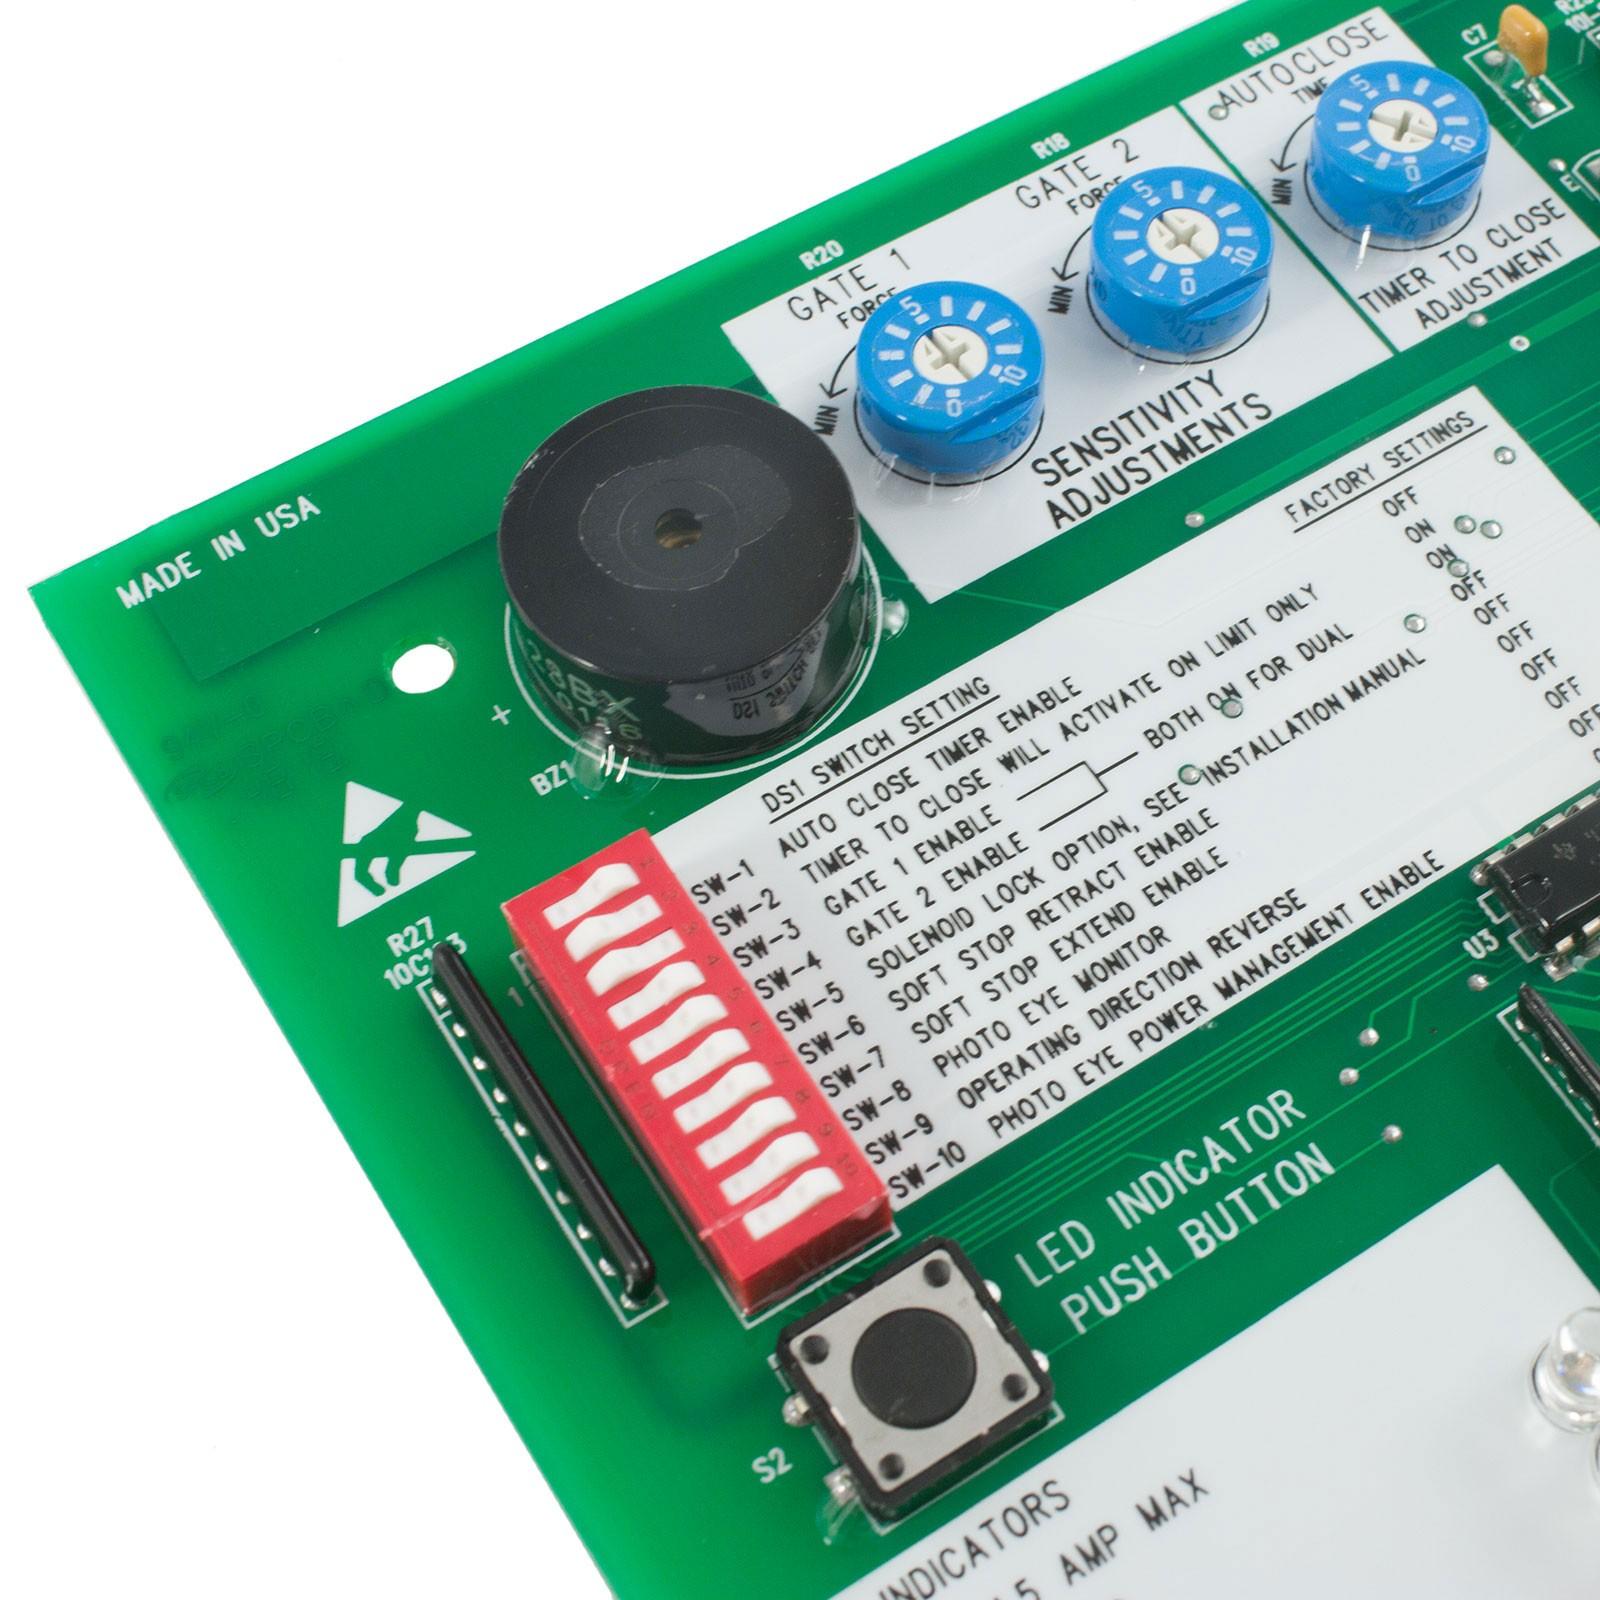 Control Board For Patriot Ul325 2016 Usautomatic 500002